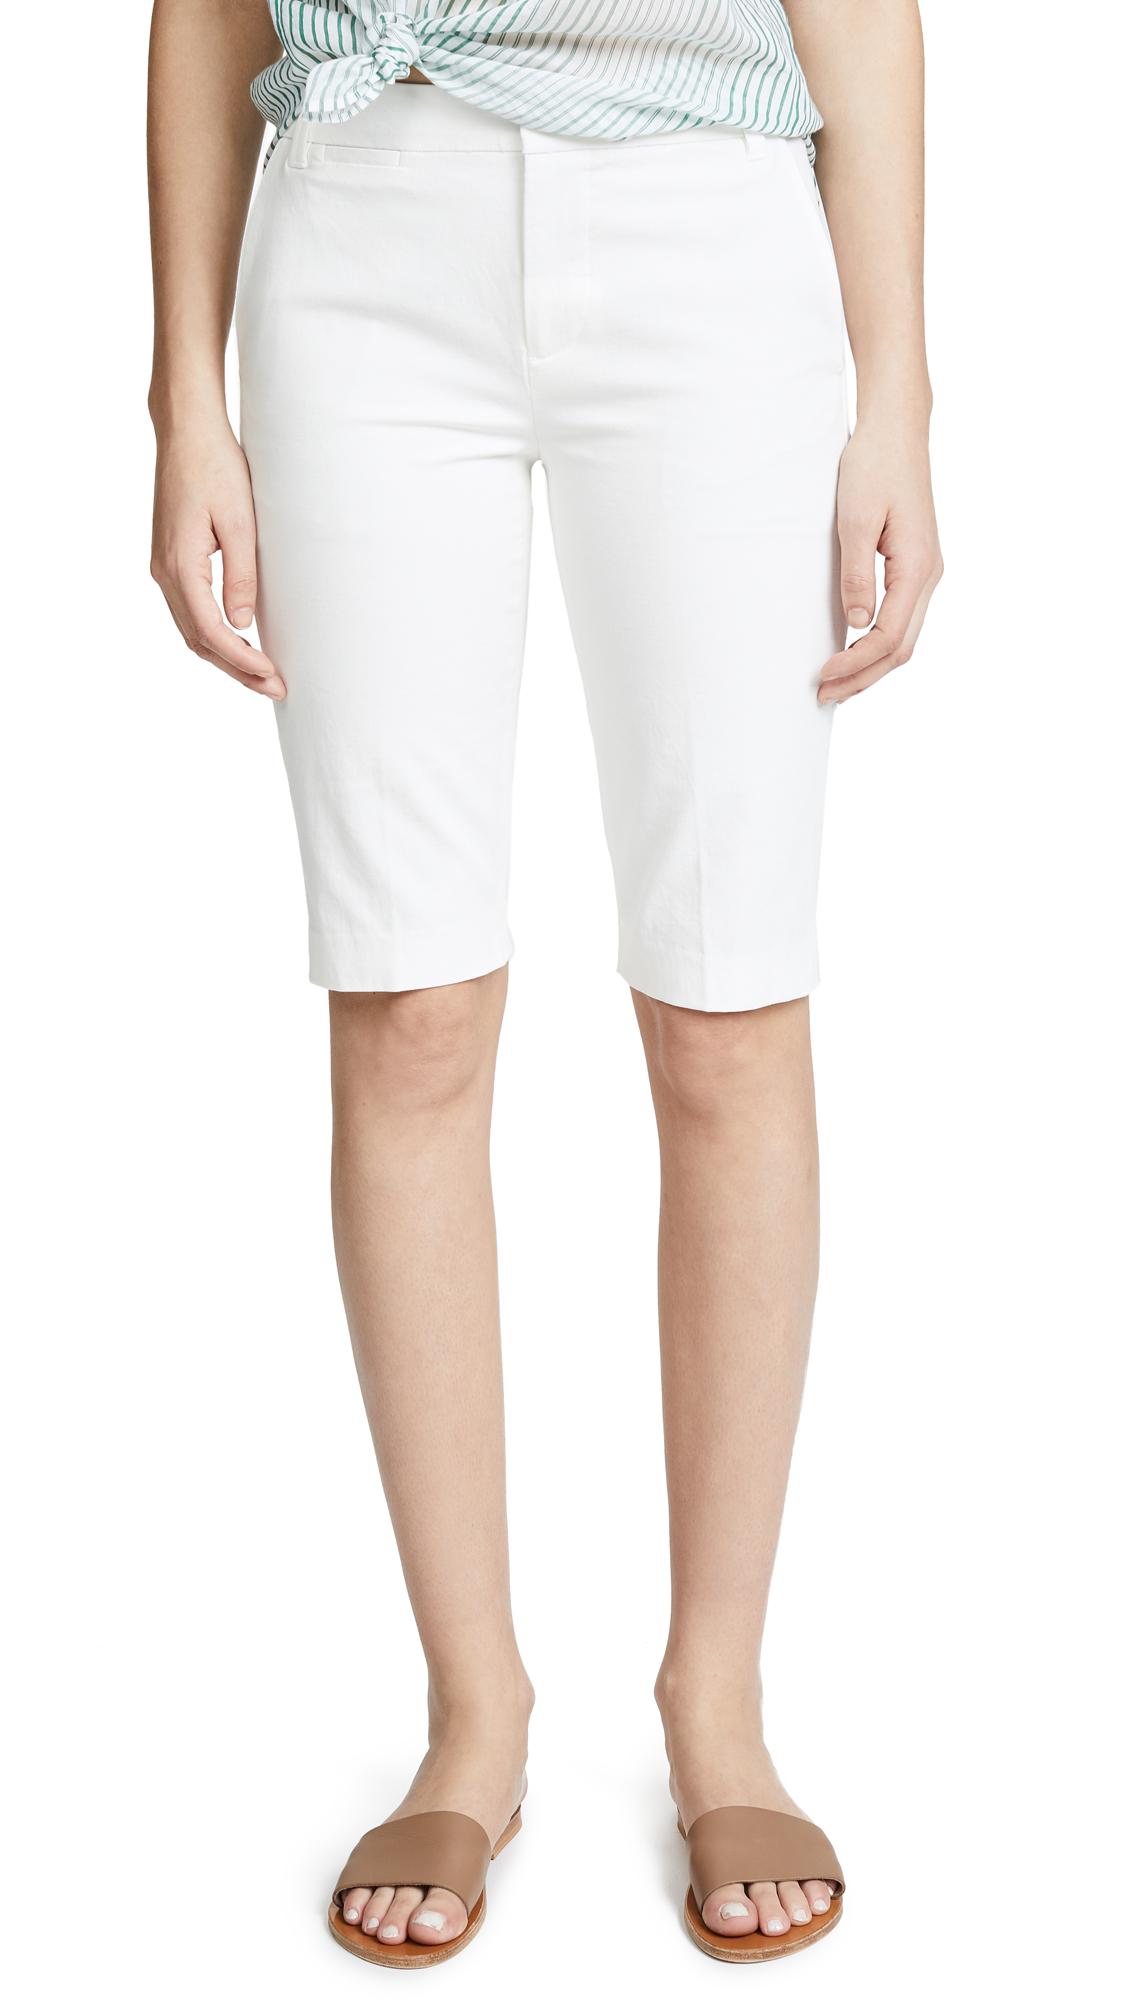 Vince Coin Pocket Bermuda Shorts - Off White